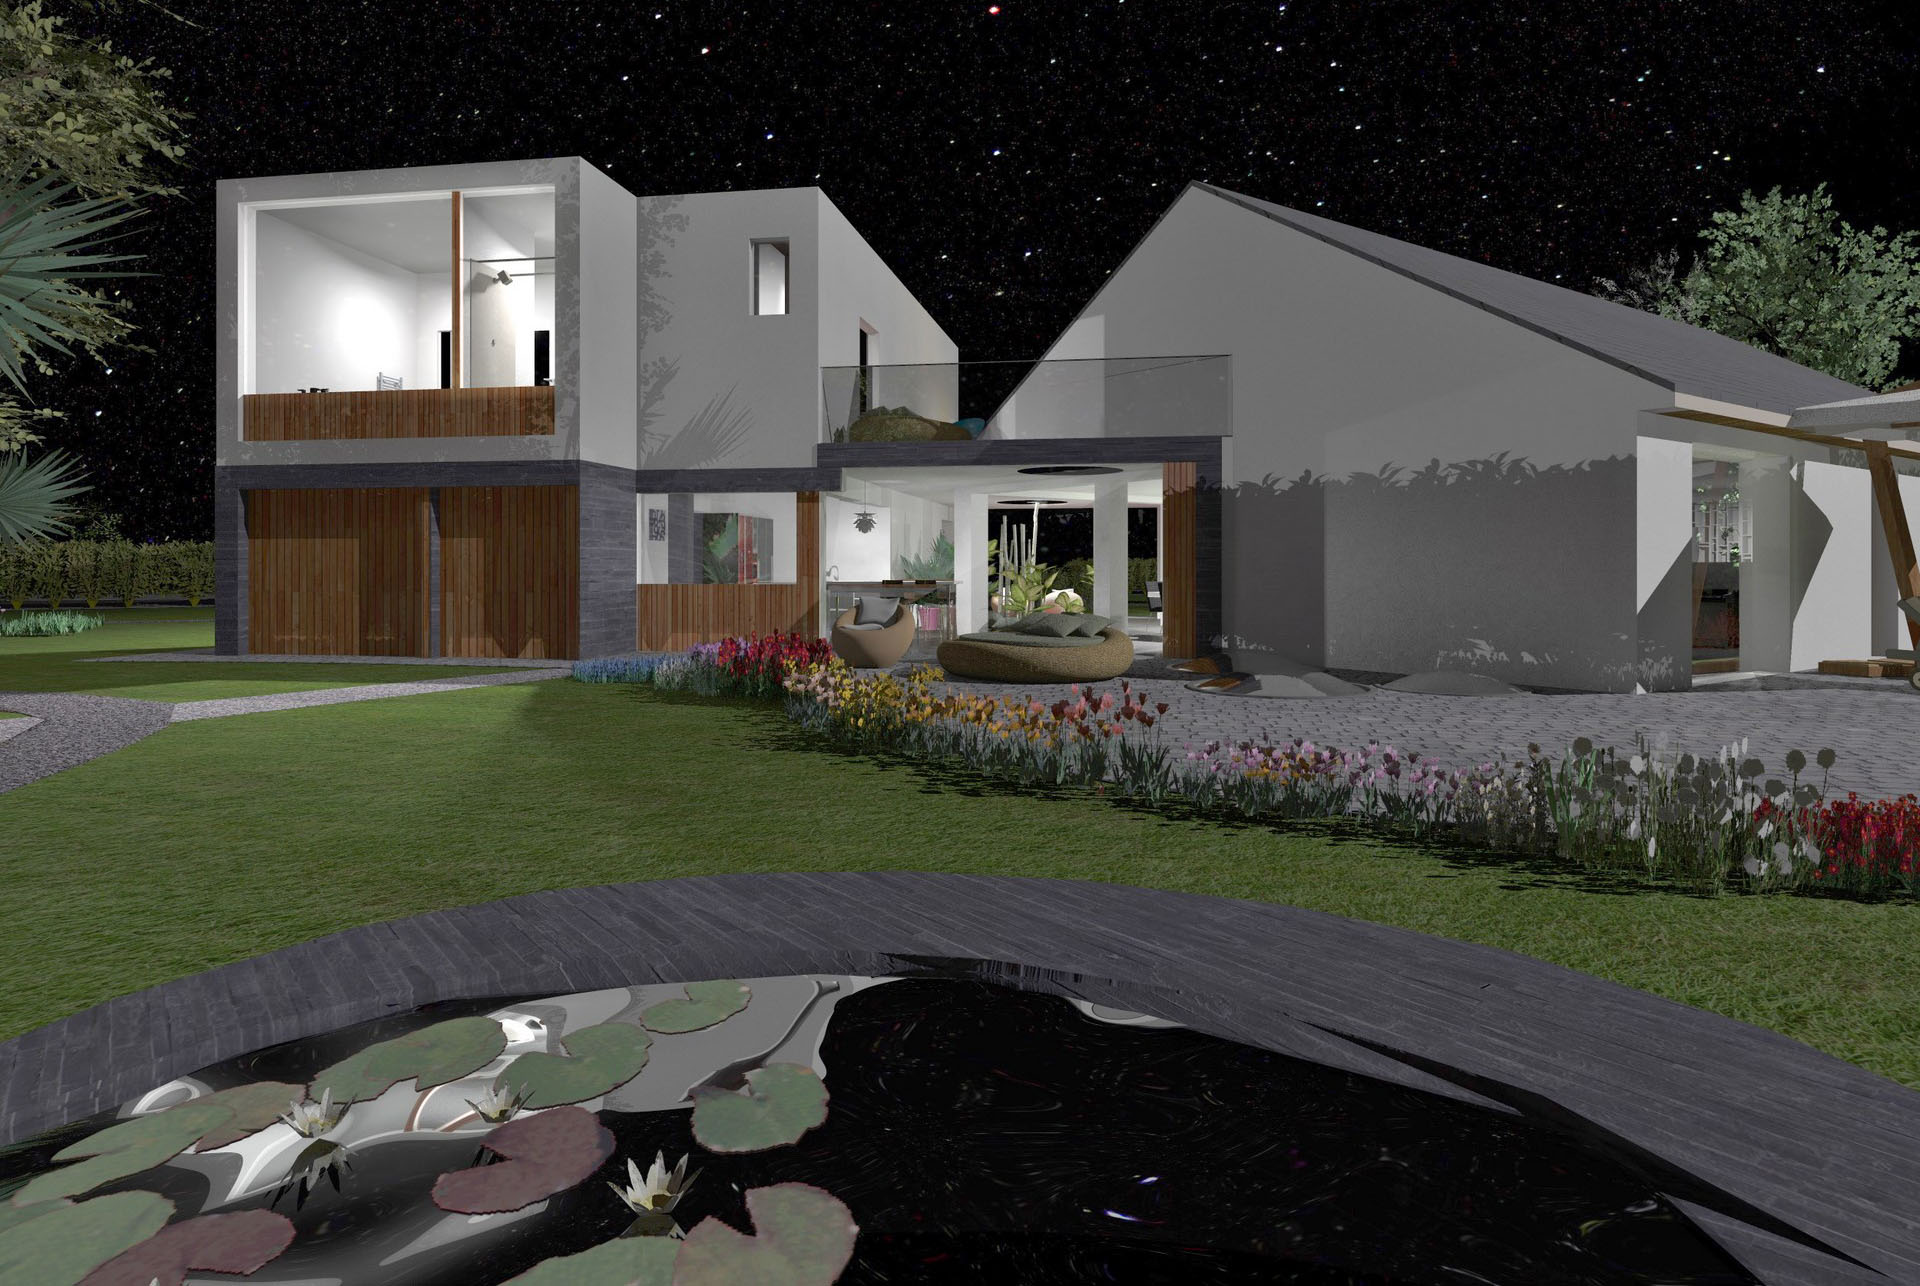 extension contemporain toiture terrasse bardage bois nuit agence avous